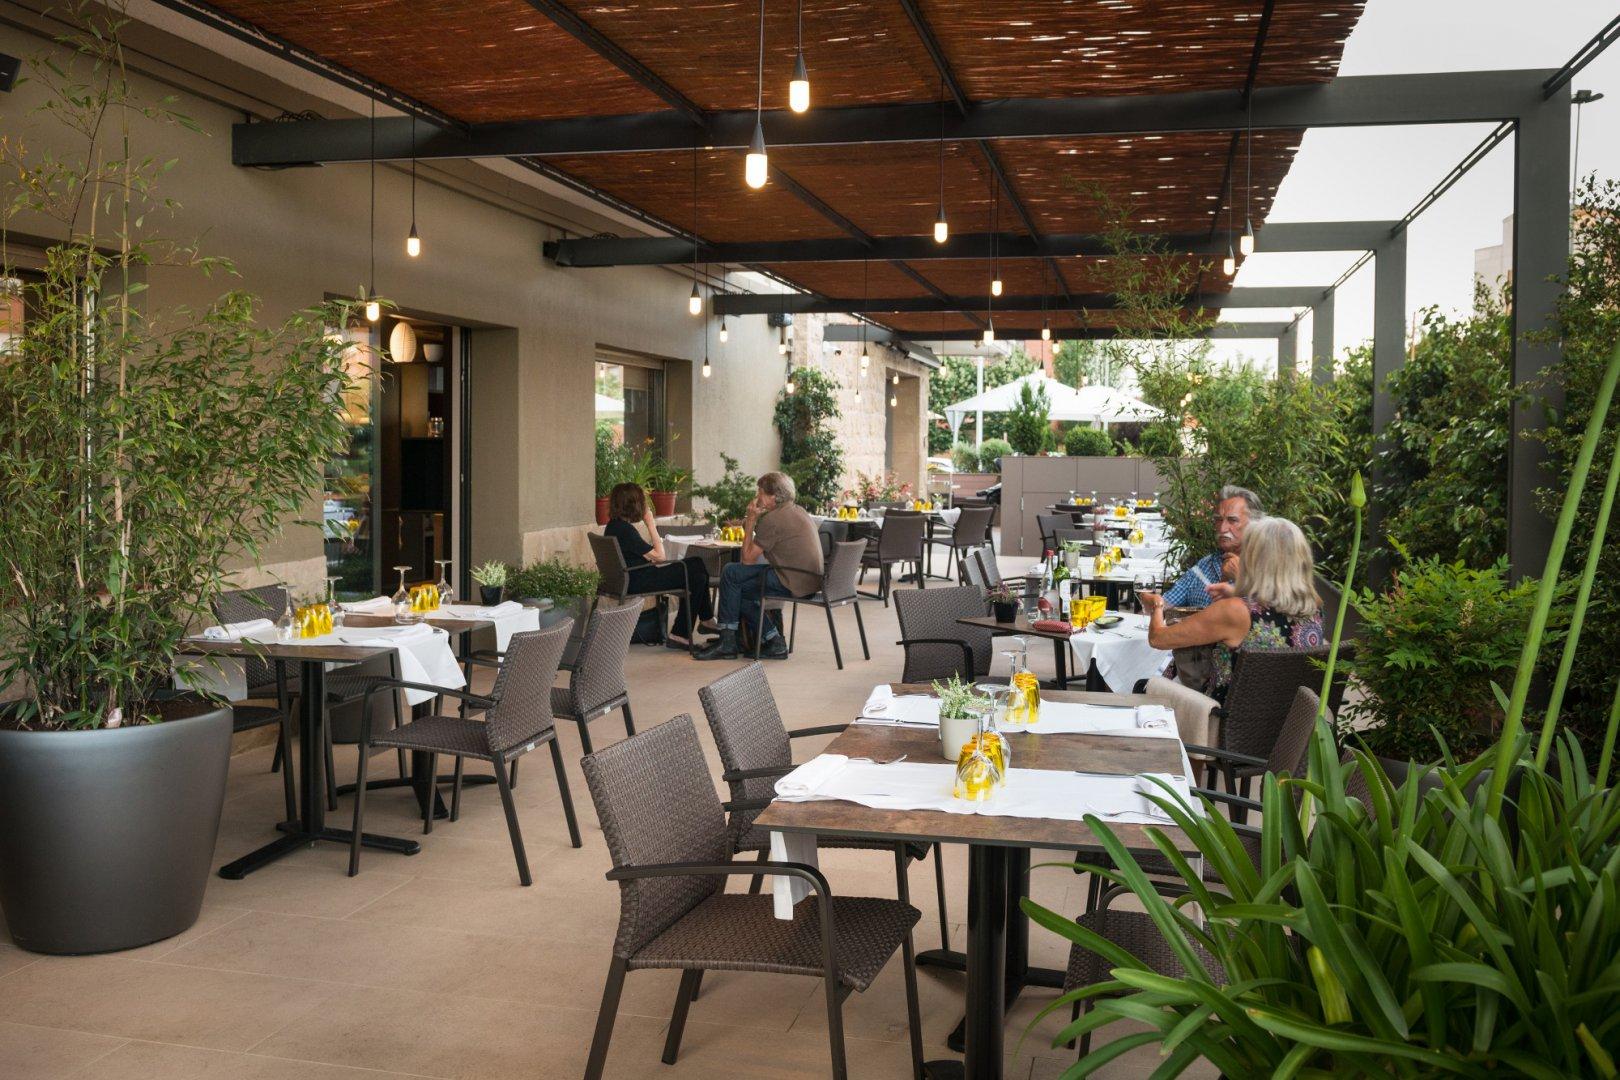 https://www.restaurantronda.com/imagecache/uploads_images_paginas_home_1620x1080_c_dsc-7979-copia.jpg